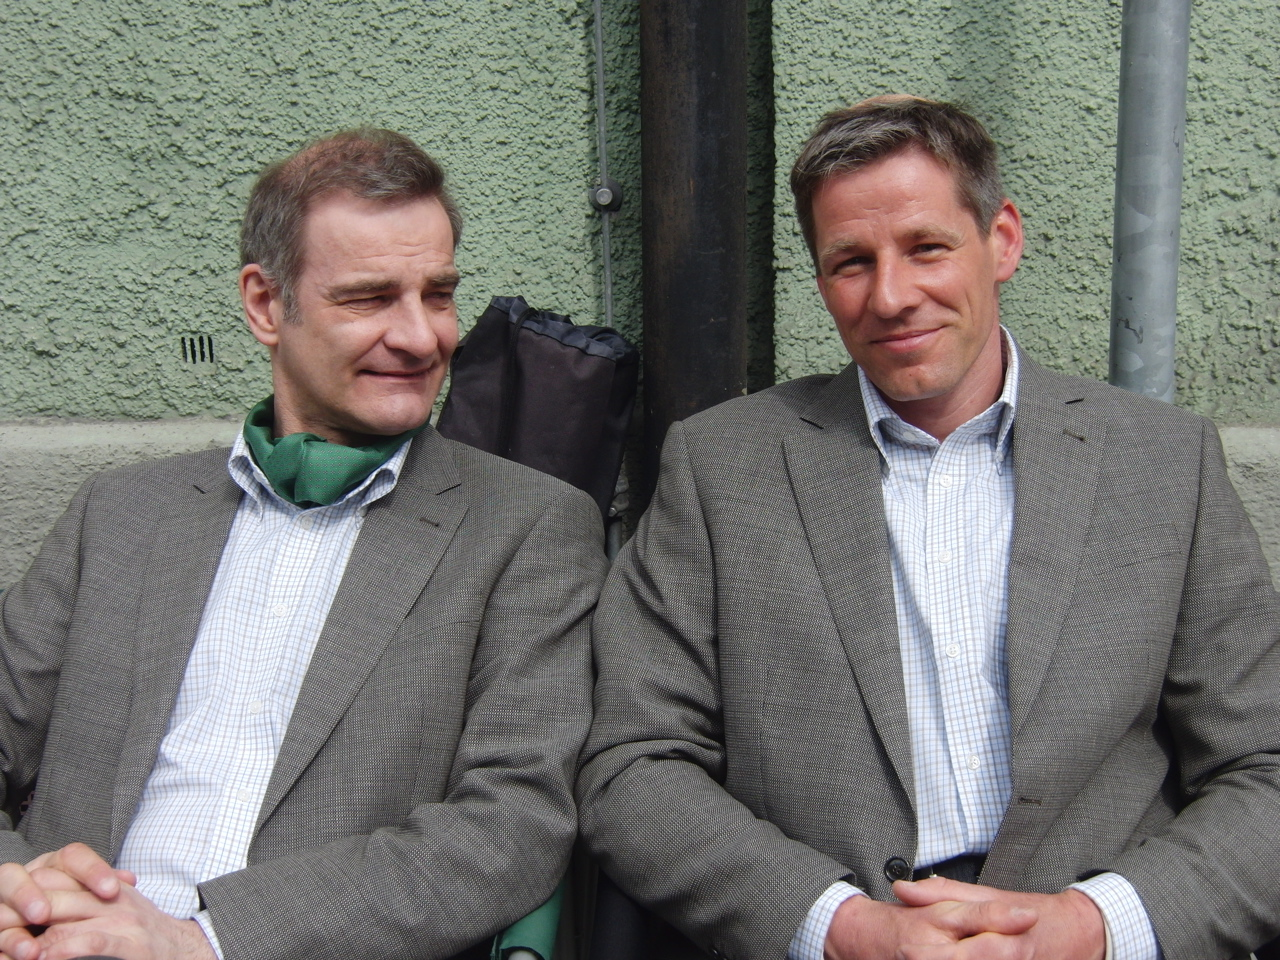 Stuntdouble Tim Vetter - Soko München